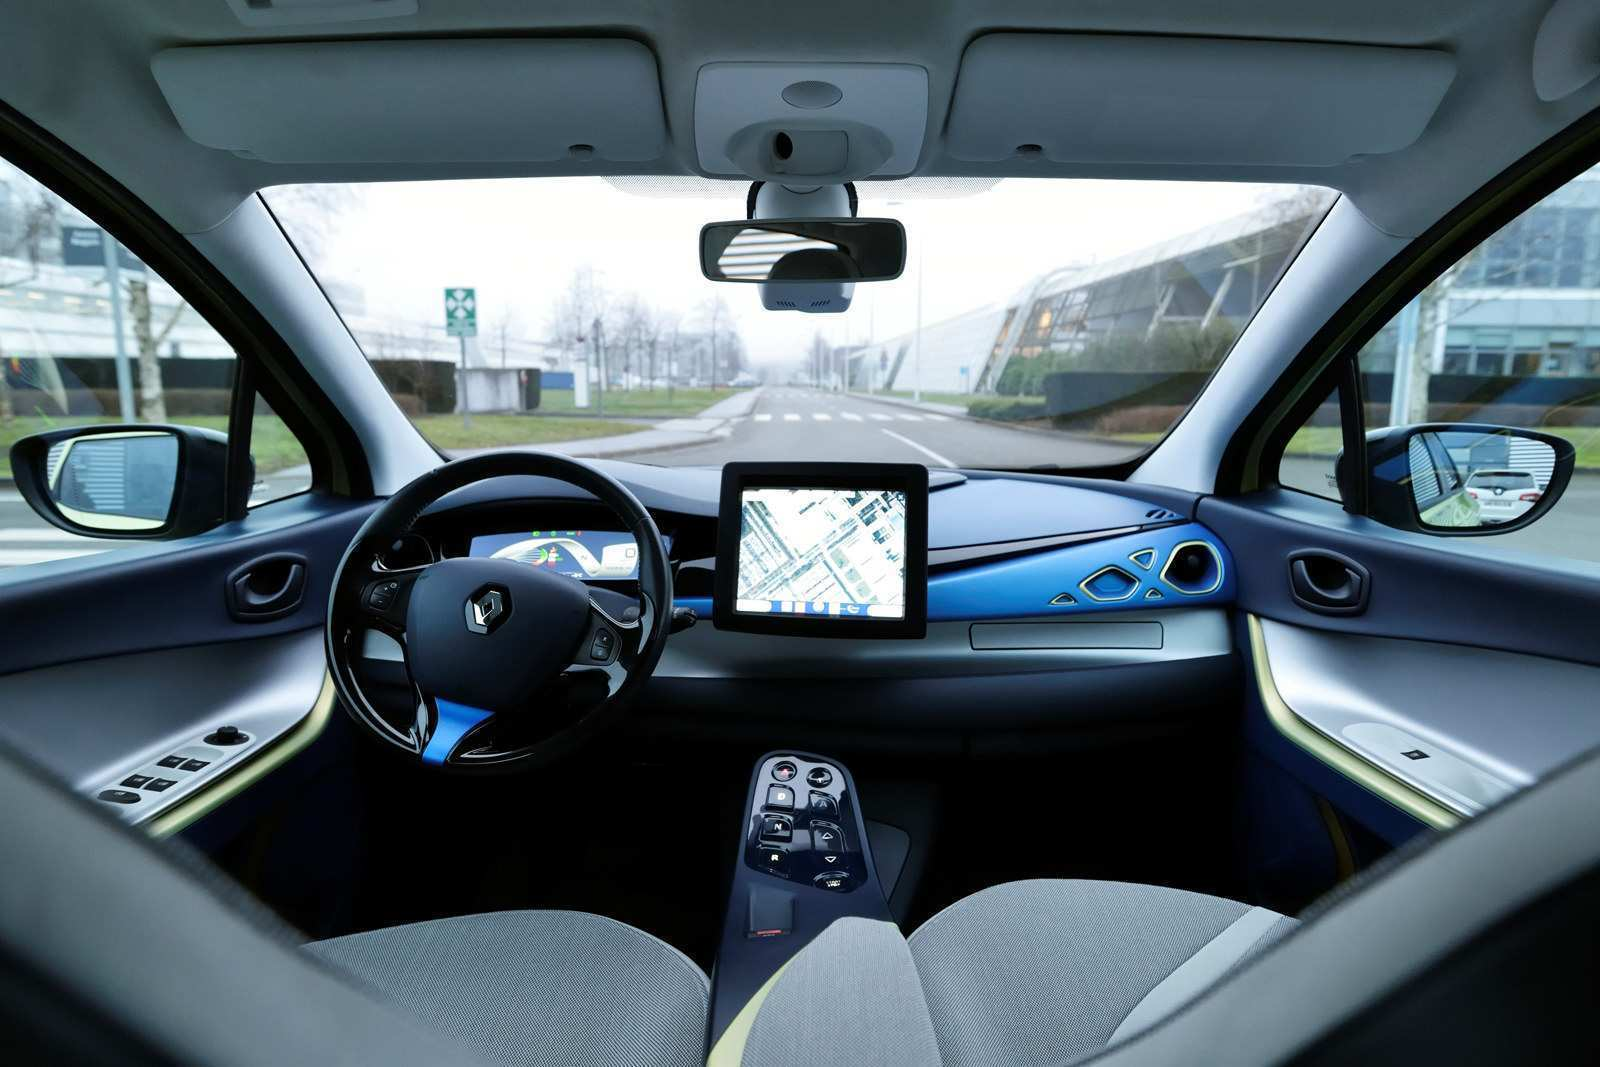 49 New Renault Zoe 2020 Release Date by Renault Zoe 2020